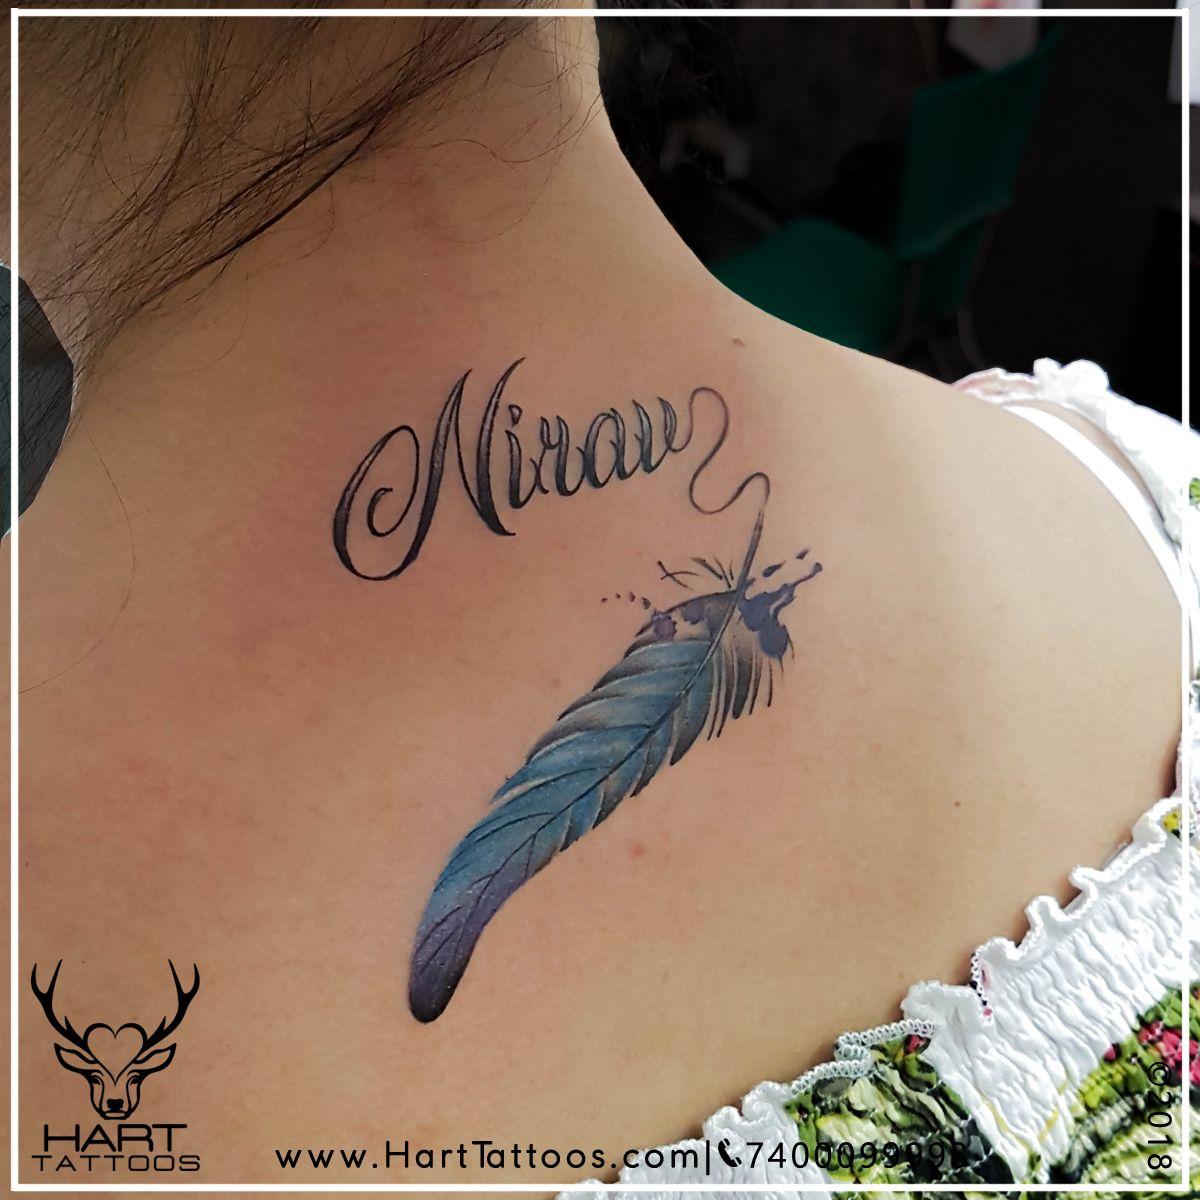 Neck Tattoo Name Tattoo Feather Tattoo Watercolour Tattoo